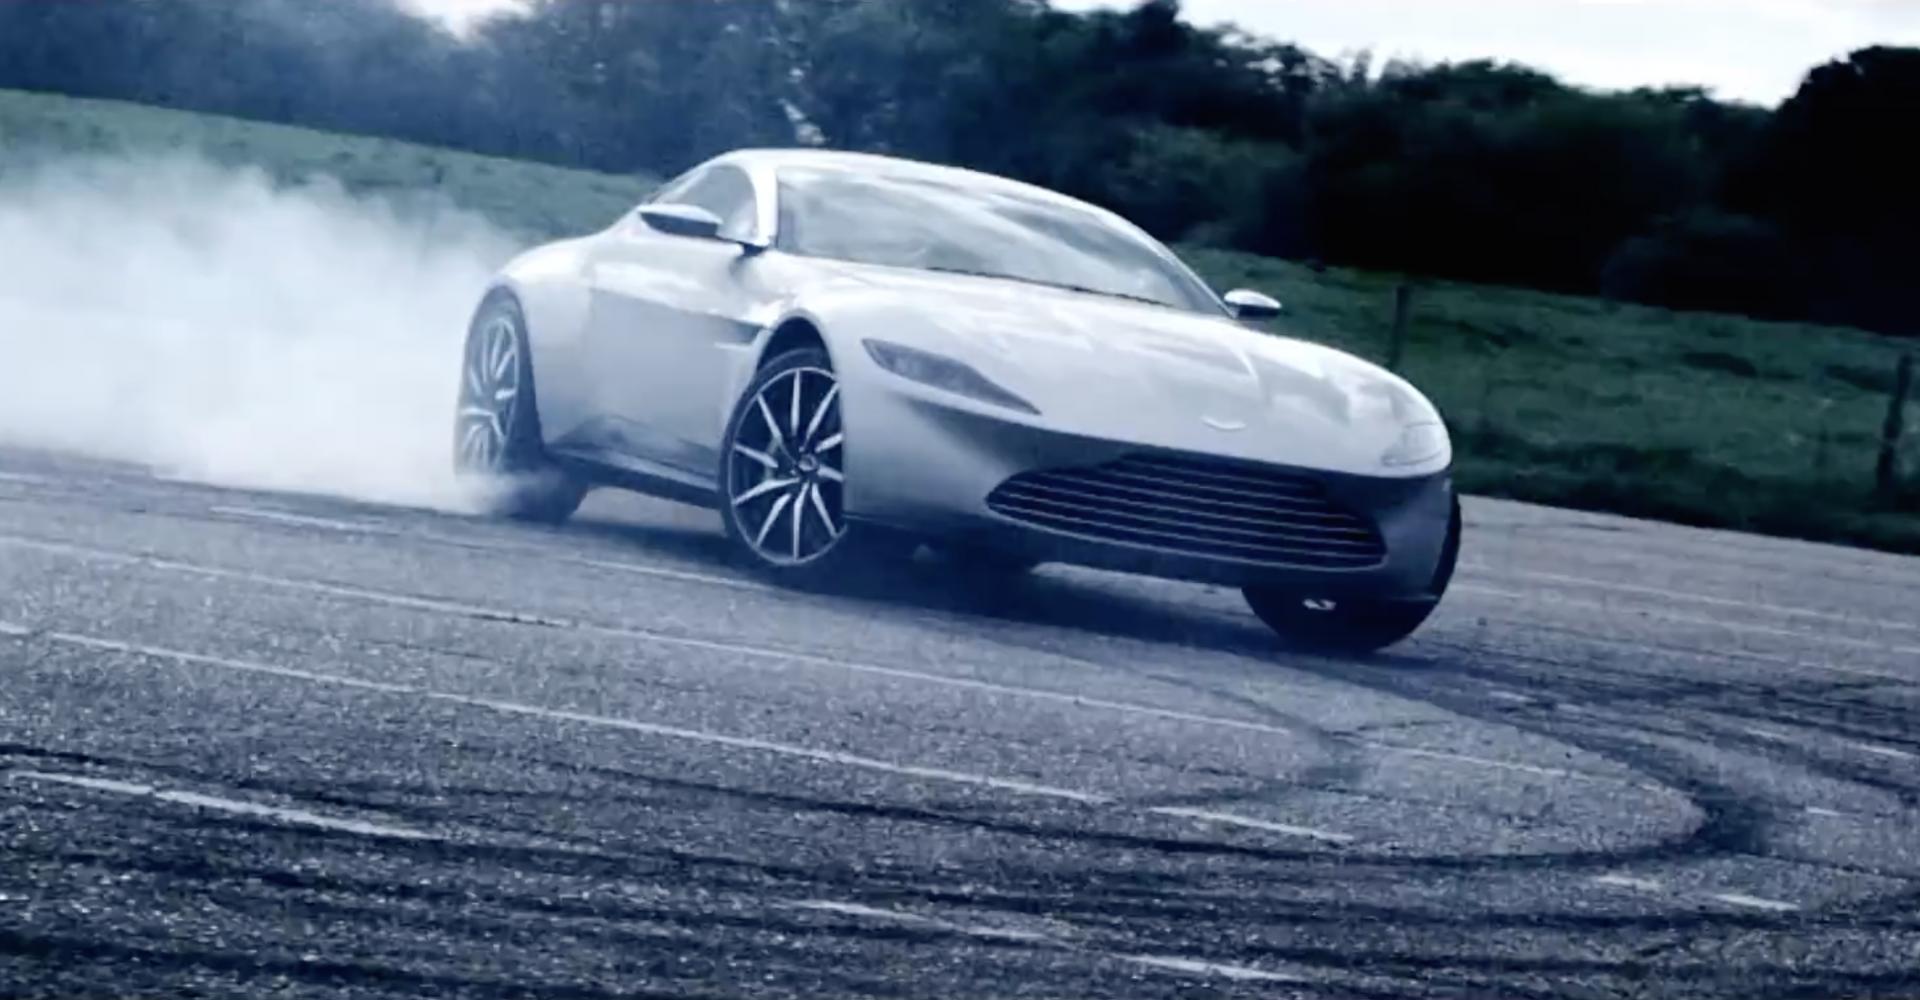 Built For Bond – The Aston Martin DB10 Makes Us Cry Happy Tears